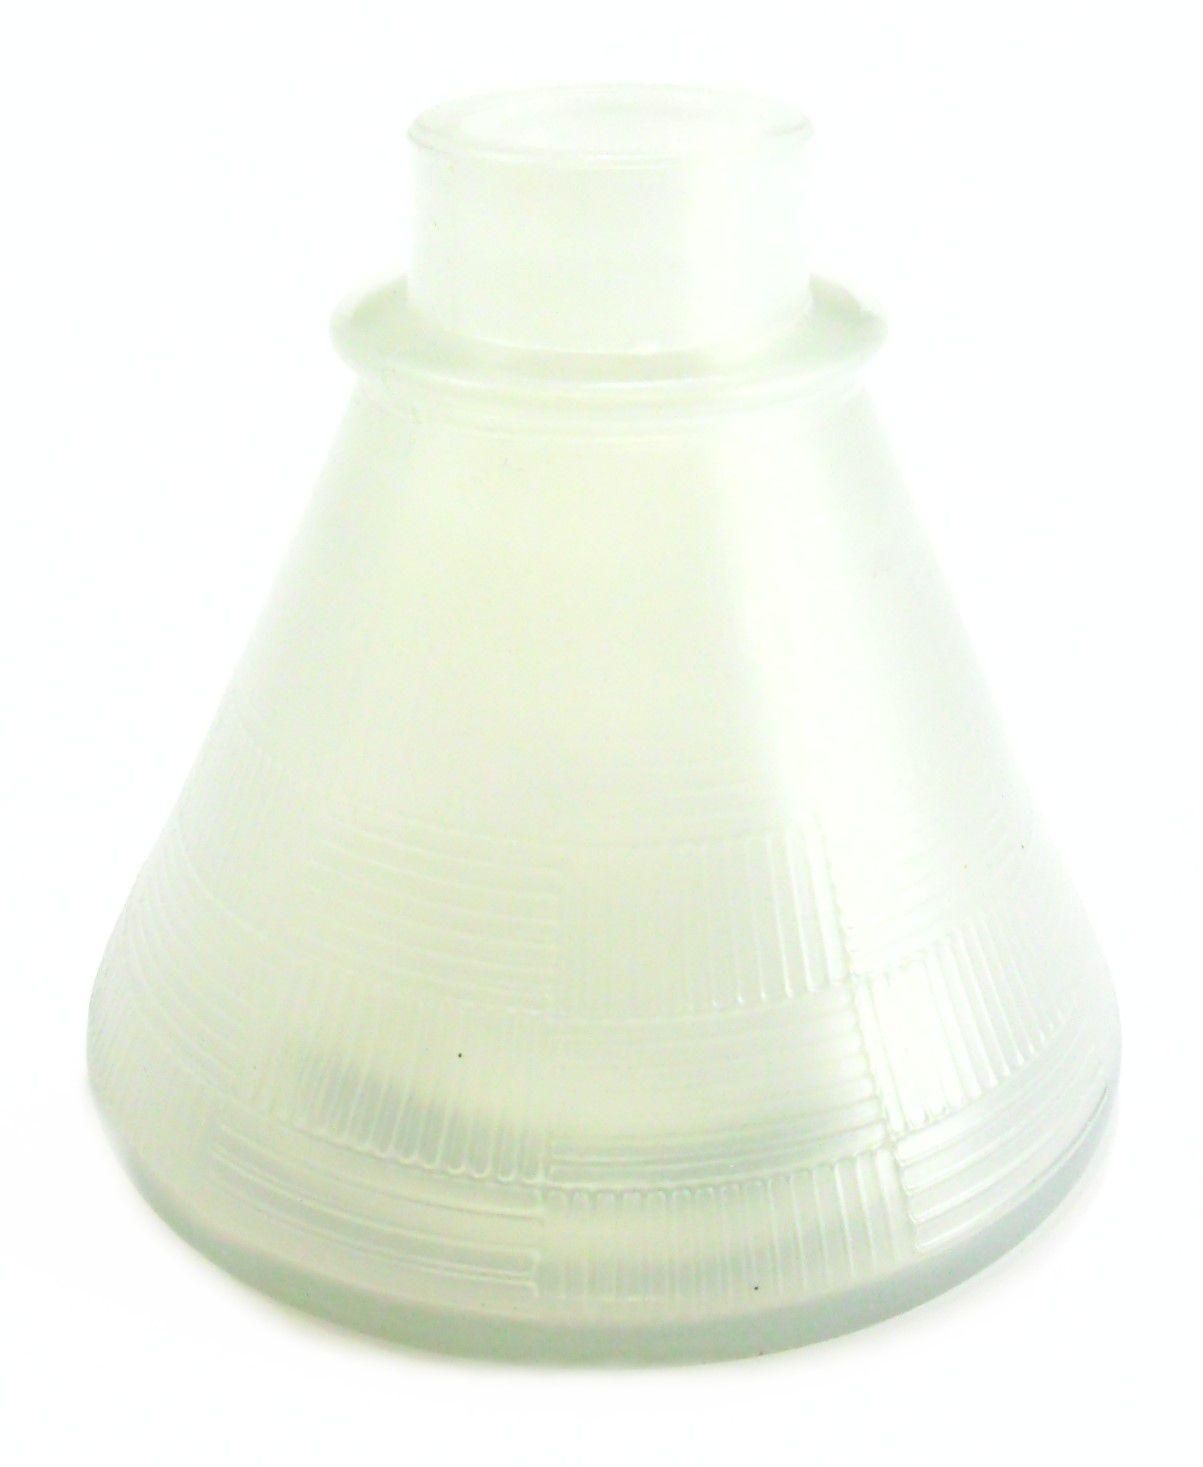 Quatro (4) vasos p/narguile base larga encaixe macho, 11cm alt. P/stems Judith, Triton, Amazon, Mya.